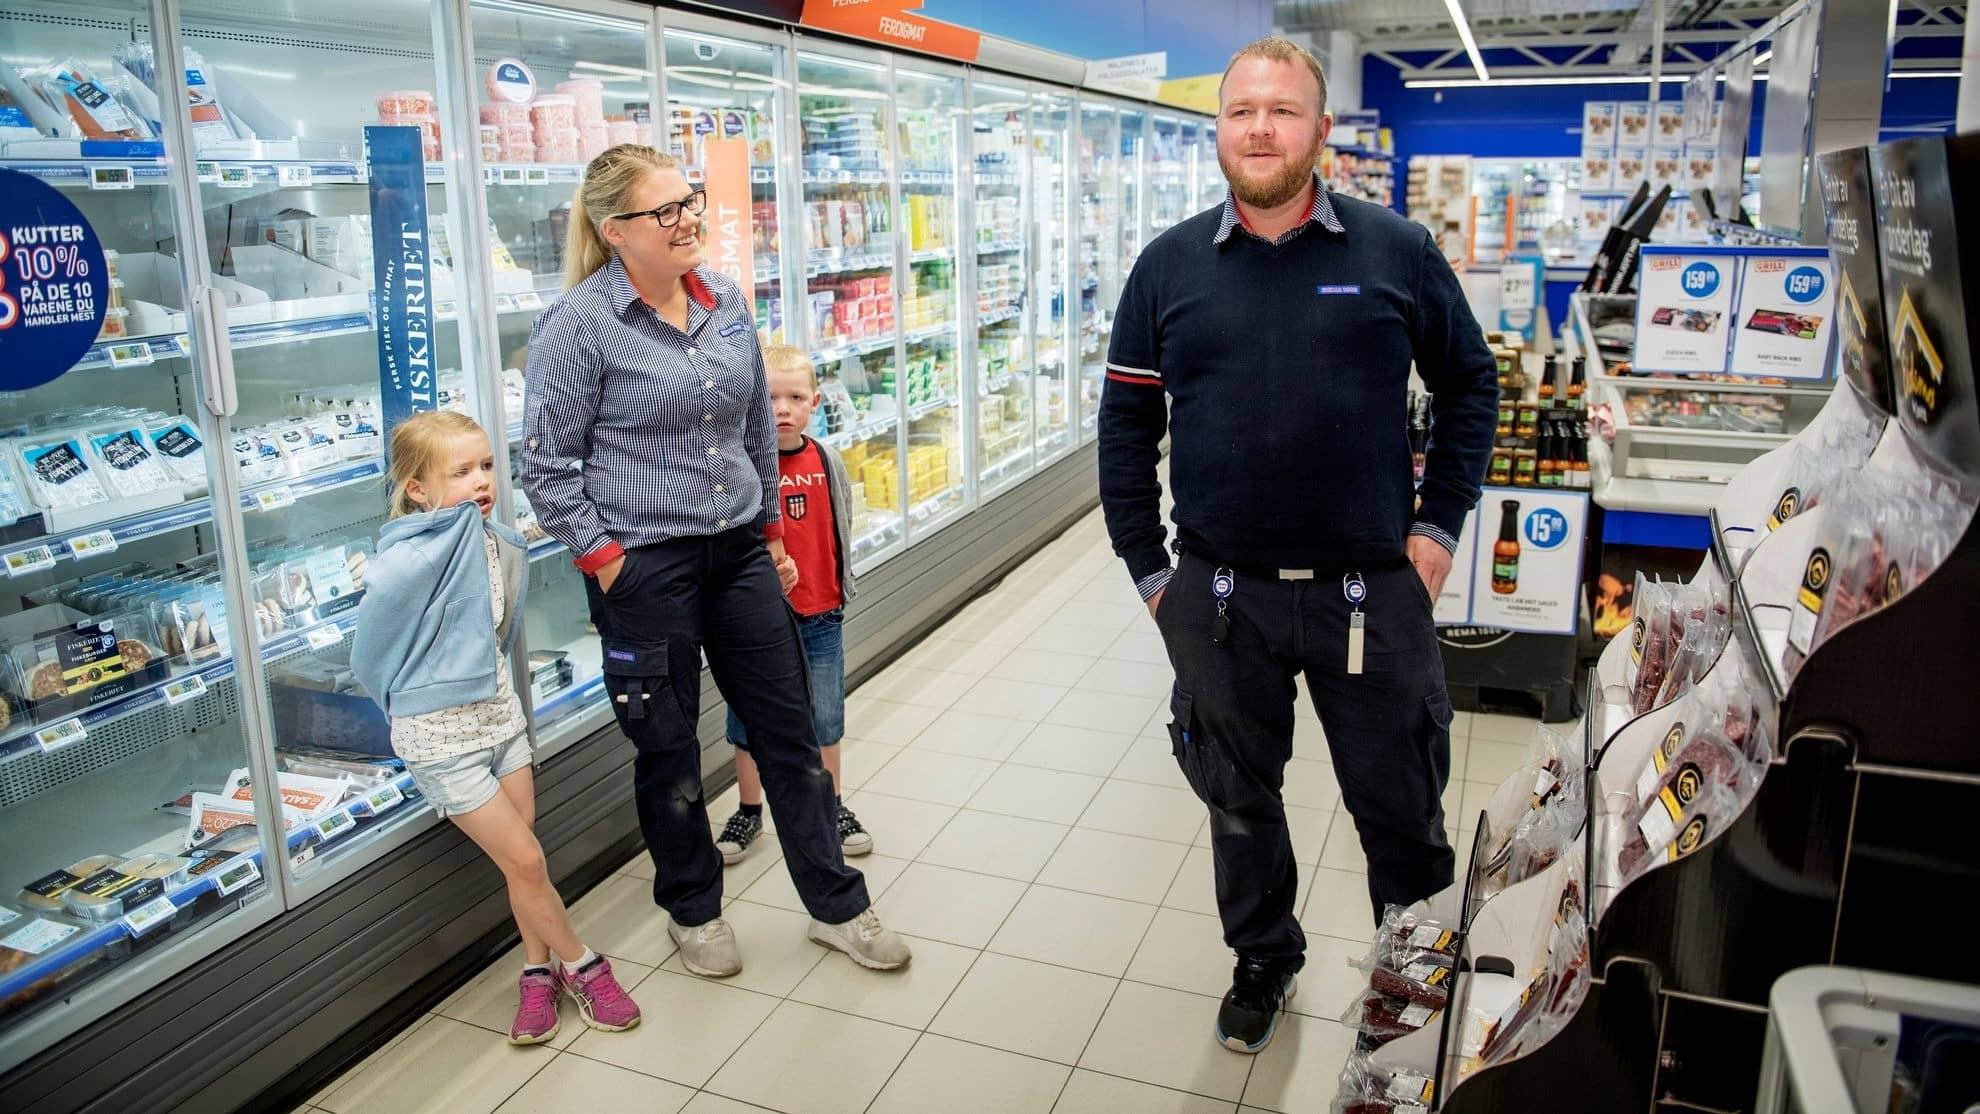 Retail, Product, Supermarket